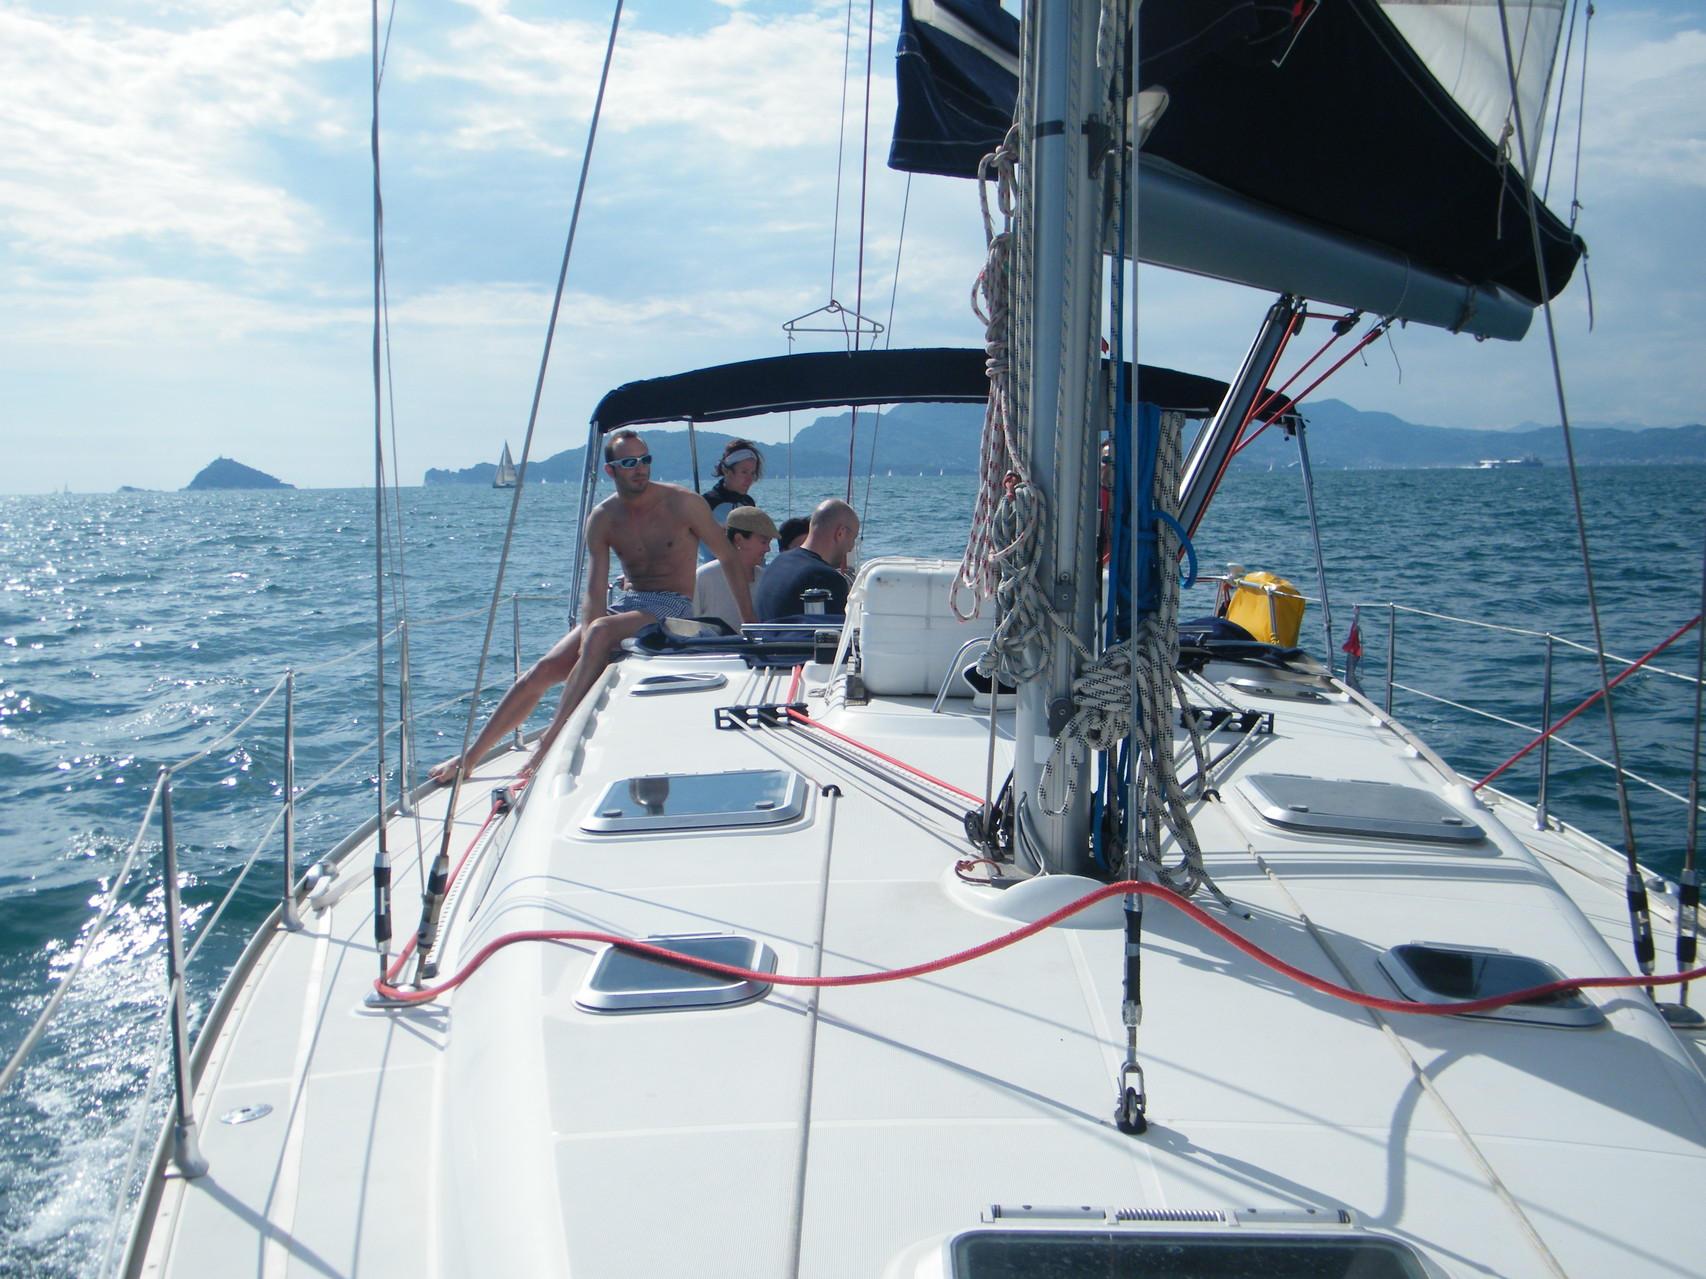 vela vacanze Cinque Terre Liguria